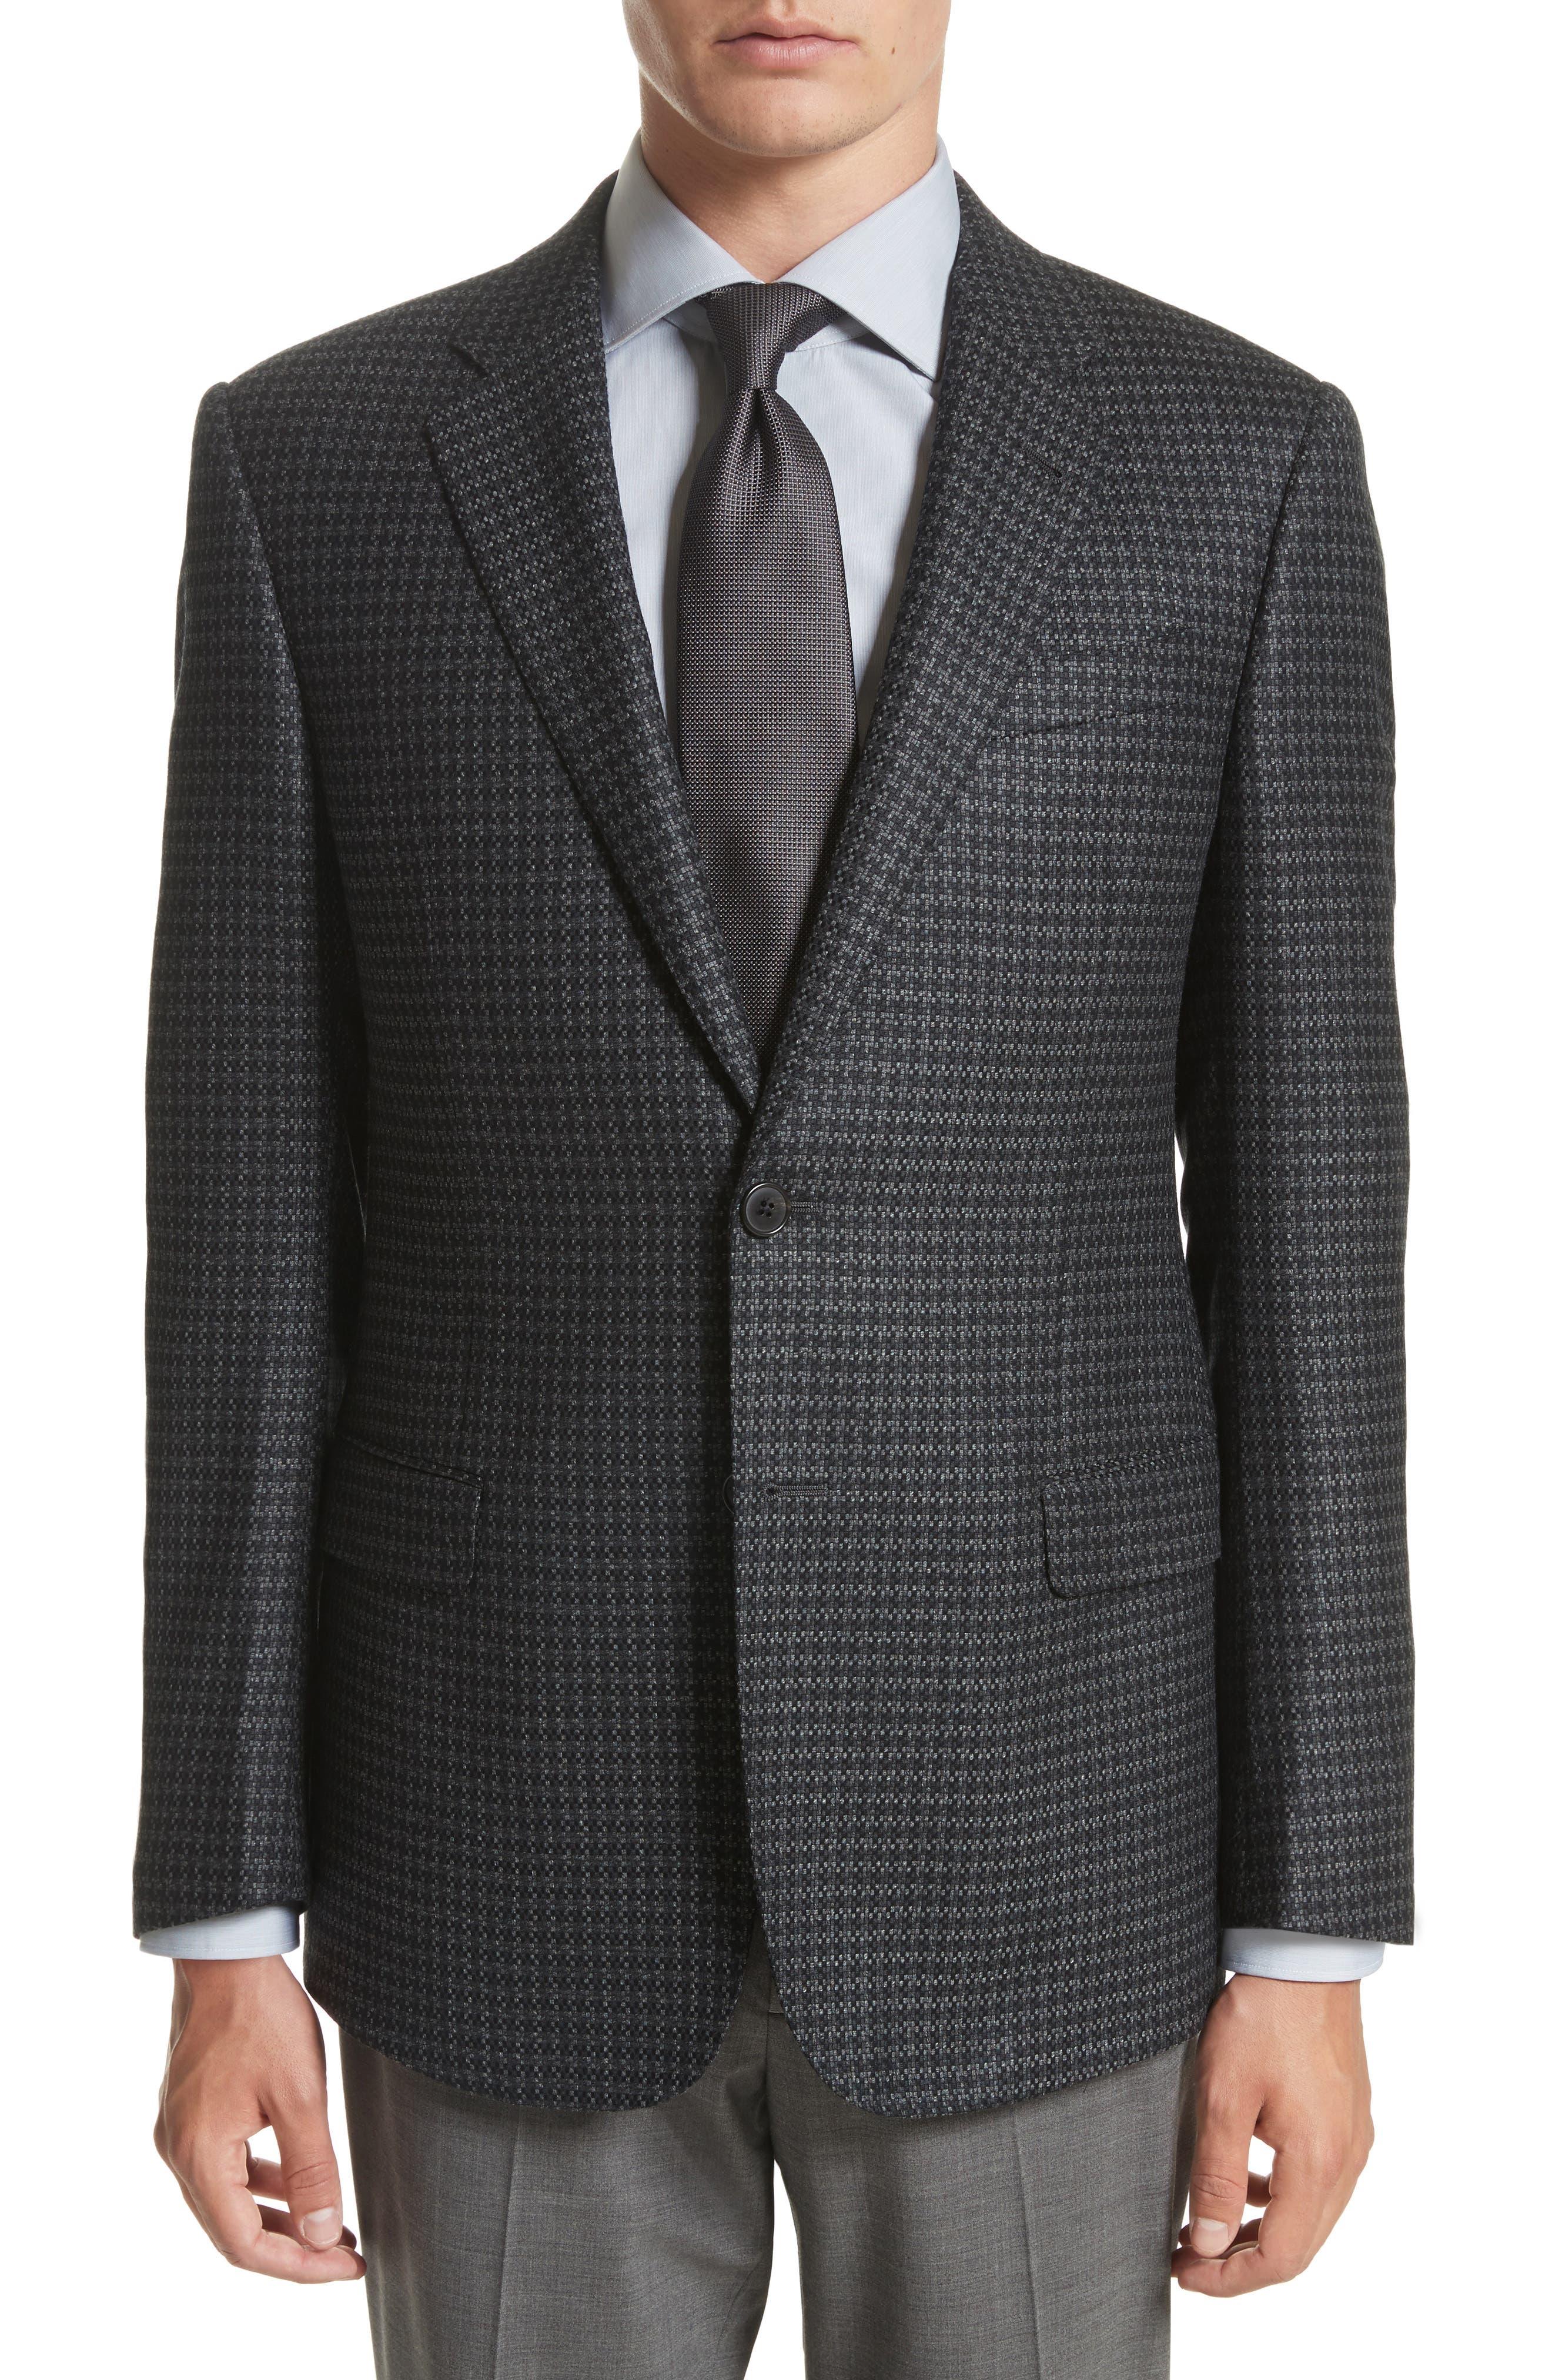 Armani Collezioni G-Line Trim Fit Houndstooth Wool & Cashmere Sport Coat